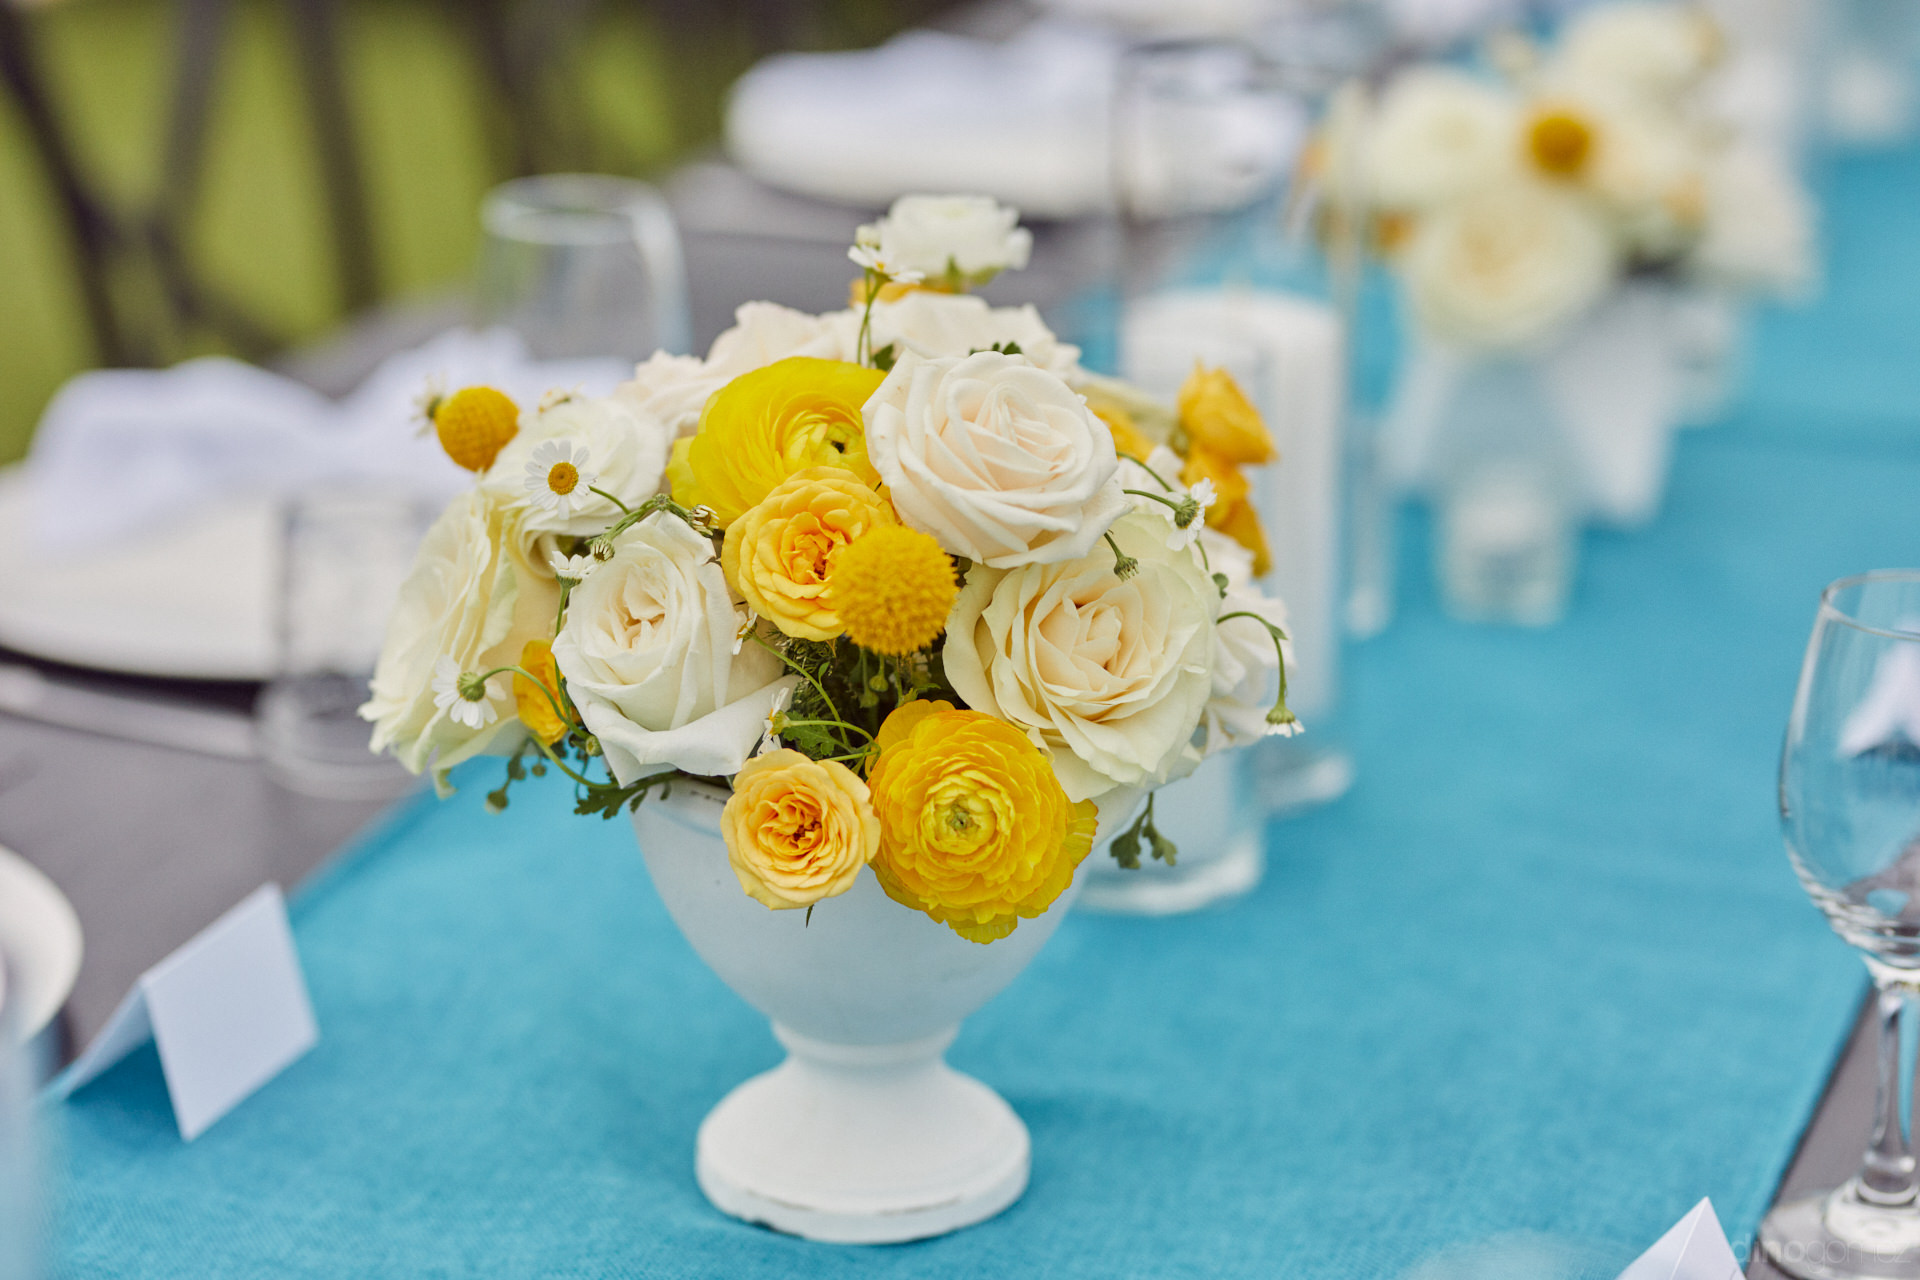 Cabo San Lucas Wedding Photographers For Weddings - Hilary & Bryan Flora Wedding